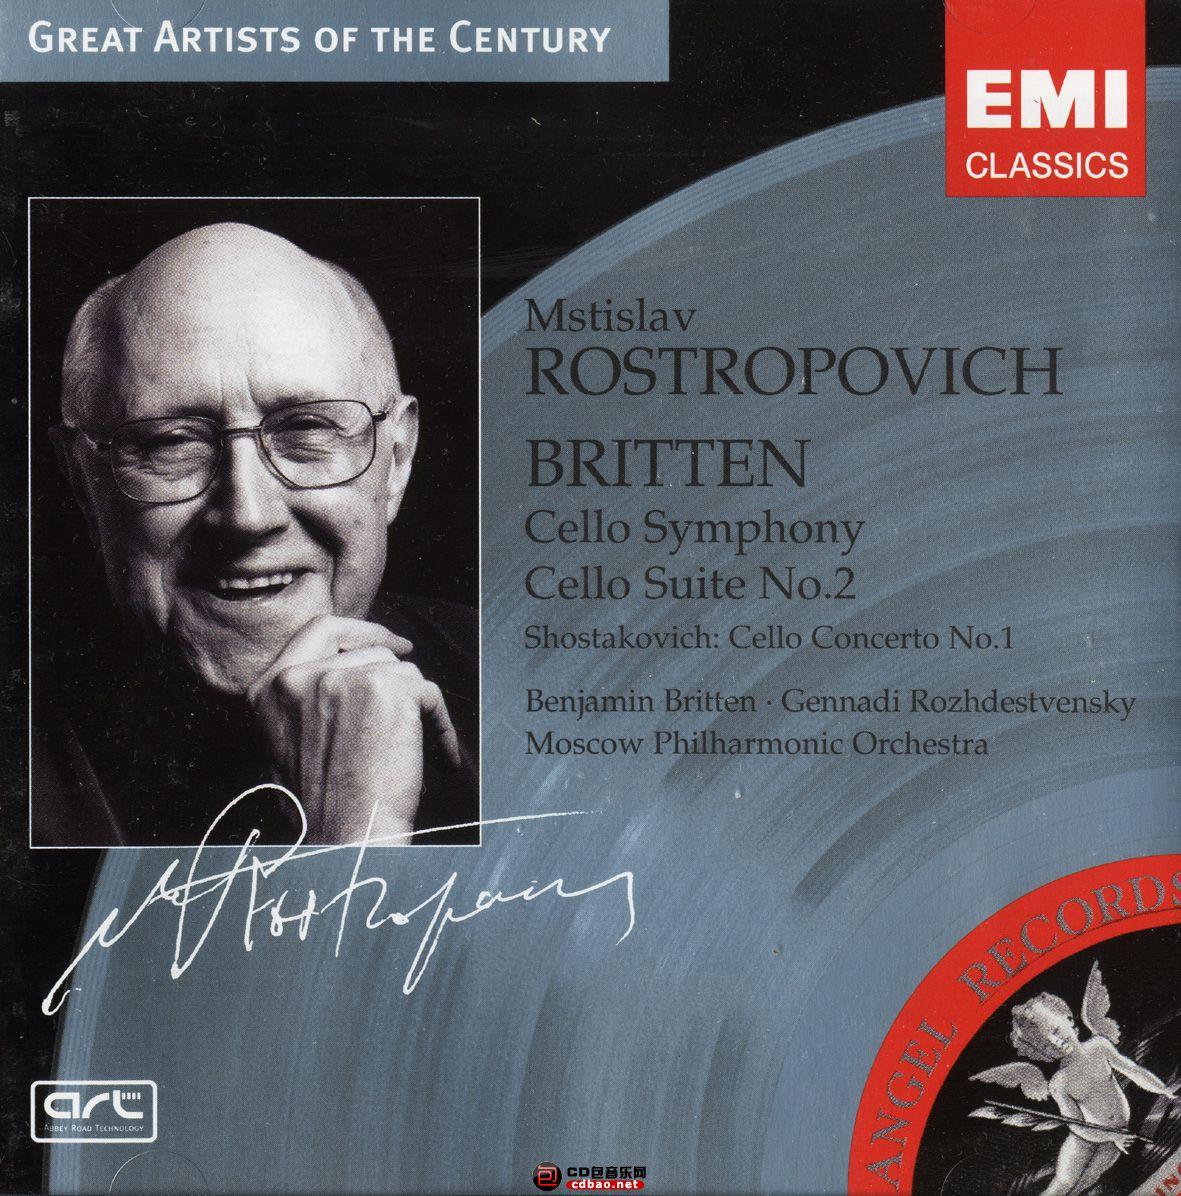 Rostropovich_Britten & Shostakovich.01.jpg